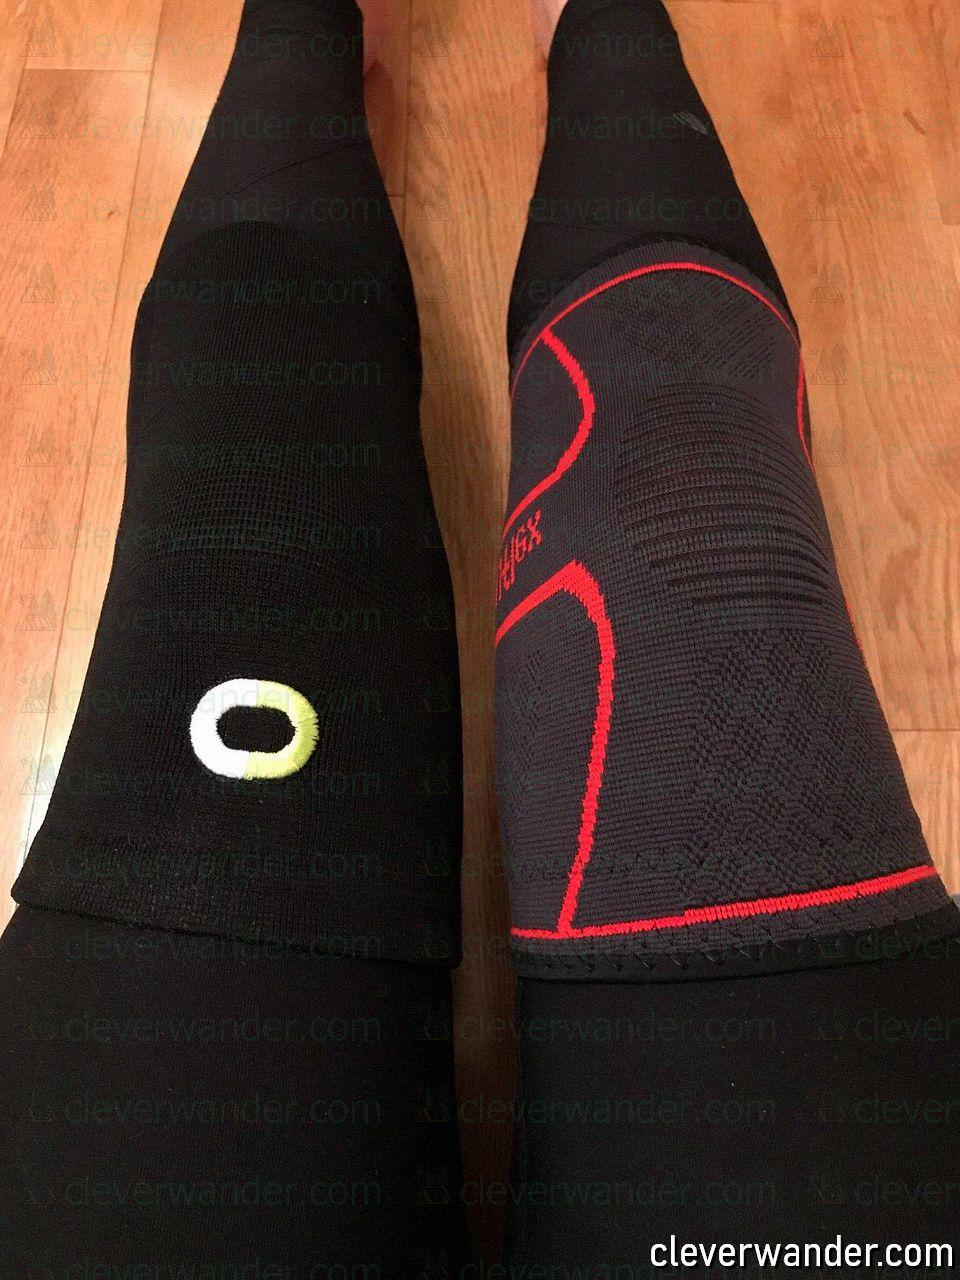 UFlex Athletics Knee Sleeve - image review 3